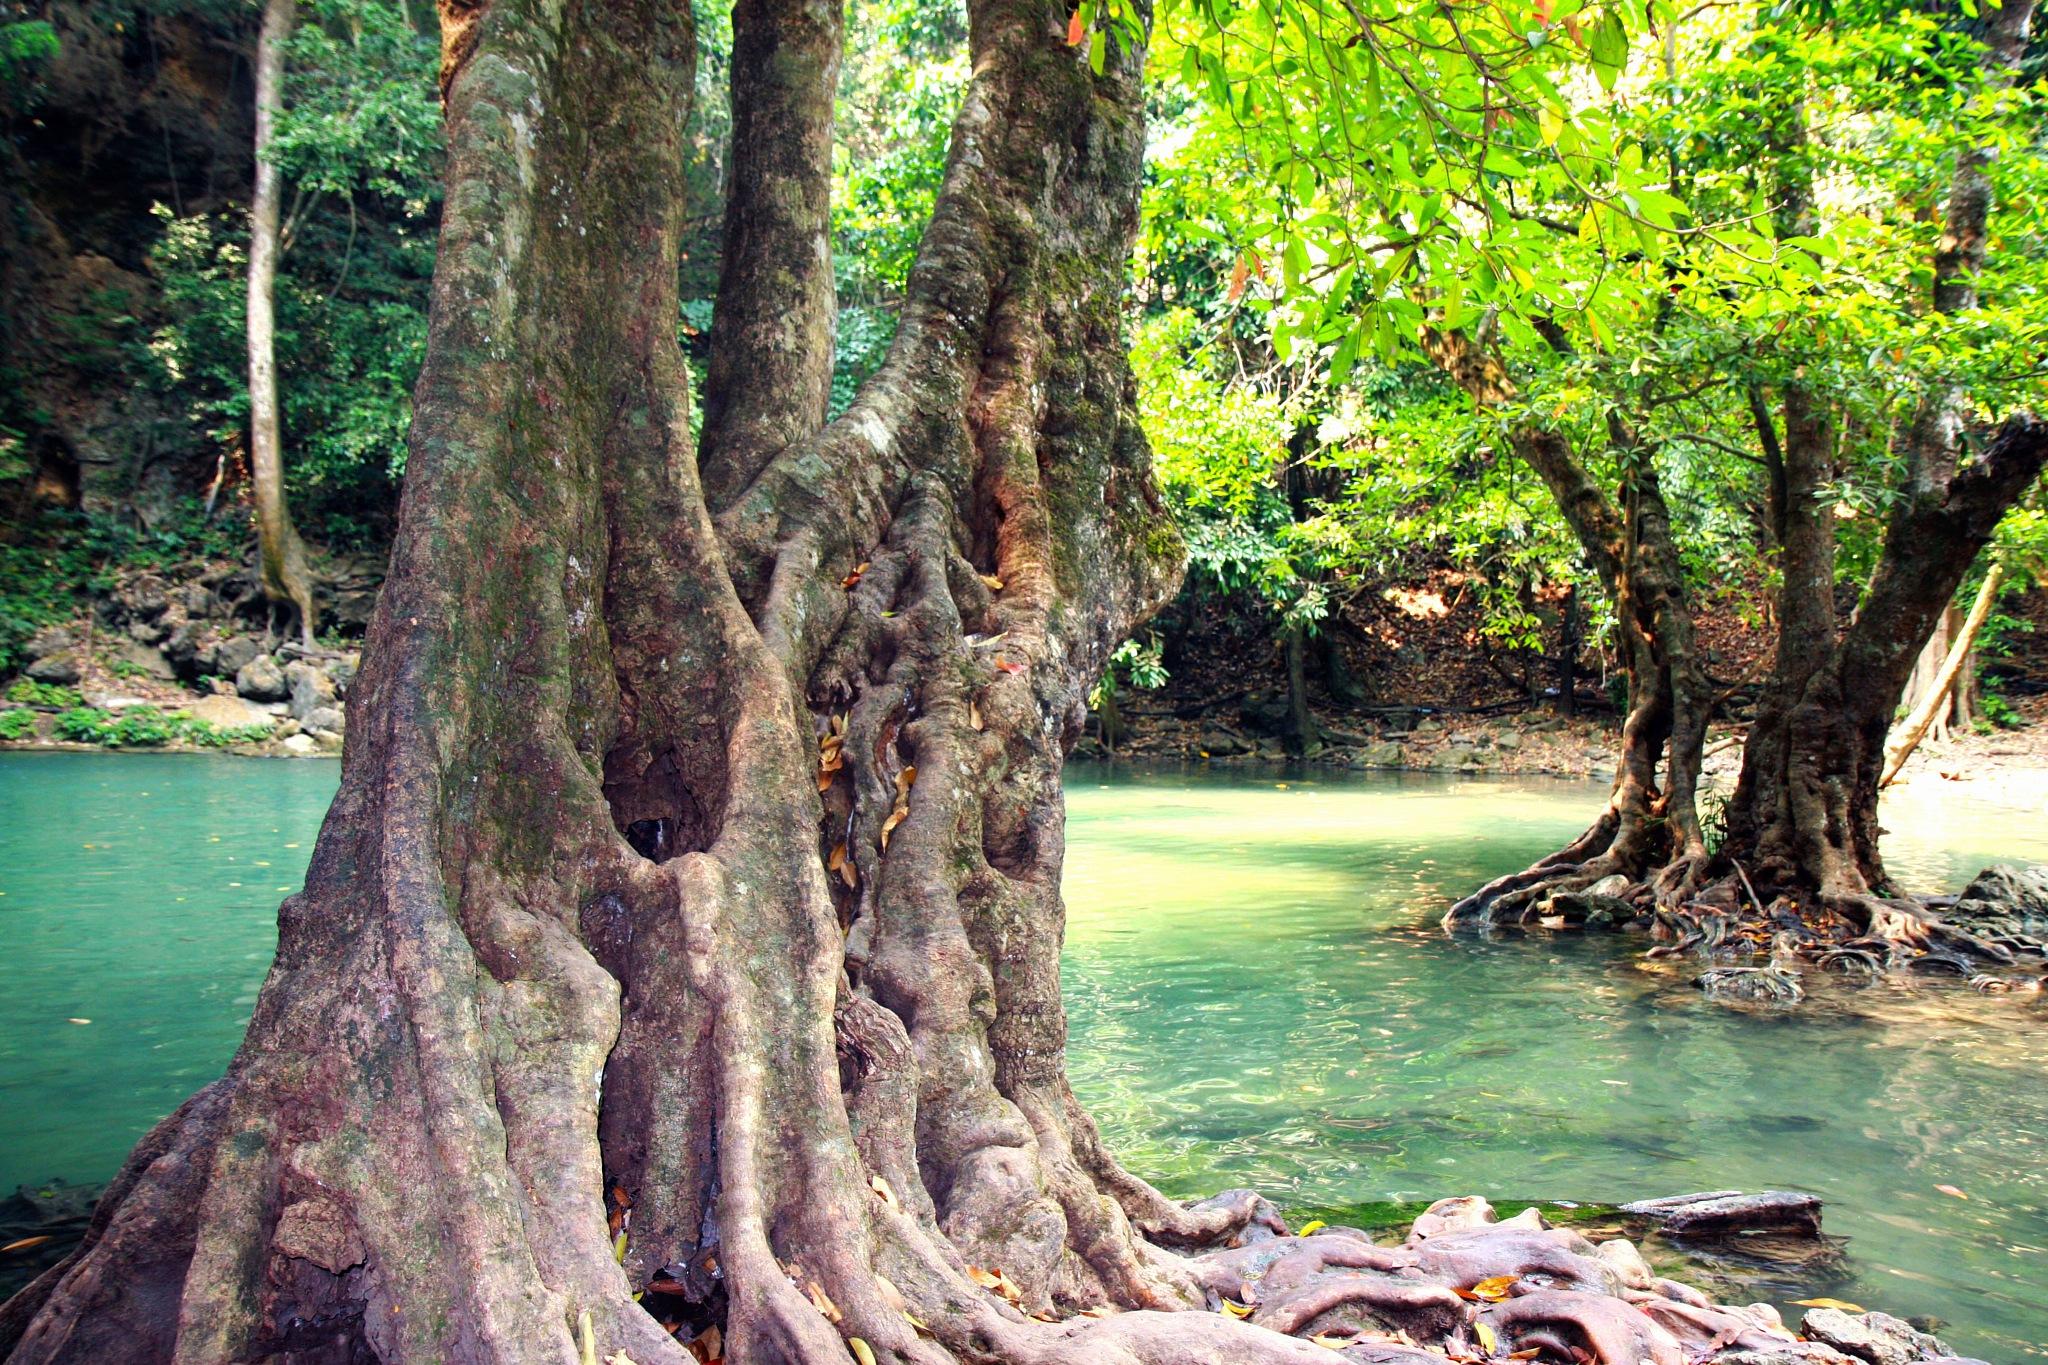 Erawan Falls Kanchanaburi, Thailand by Wendy Farrington